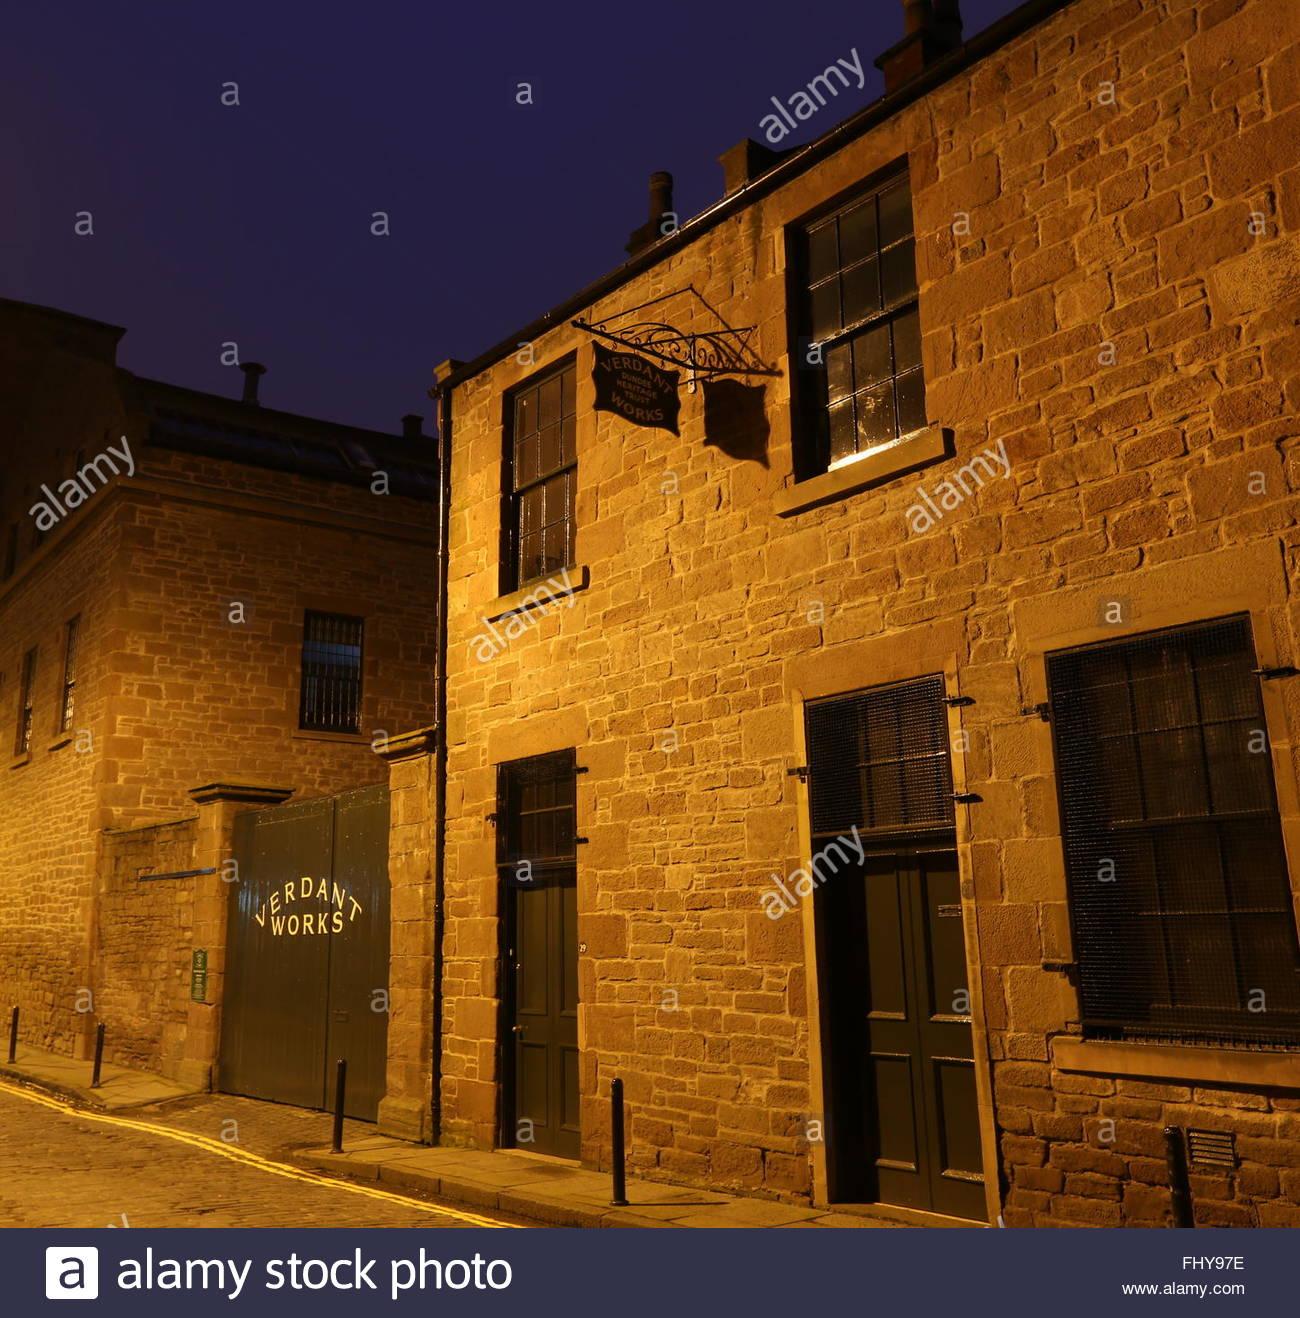 Exterior of Verdant Works Jute Mill Museum at night Dundee Scotland  December 2015 - Stock Image